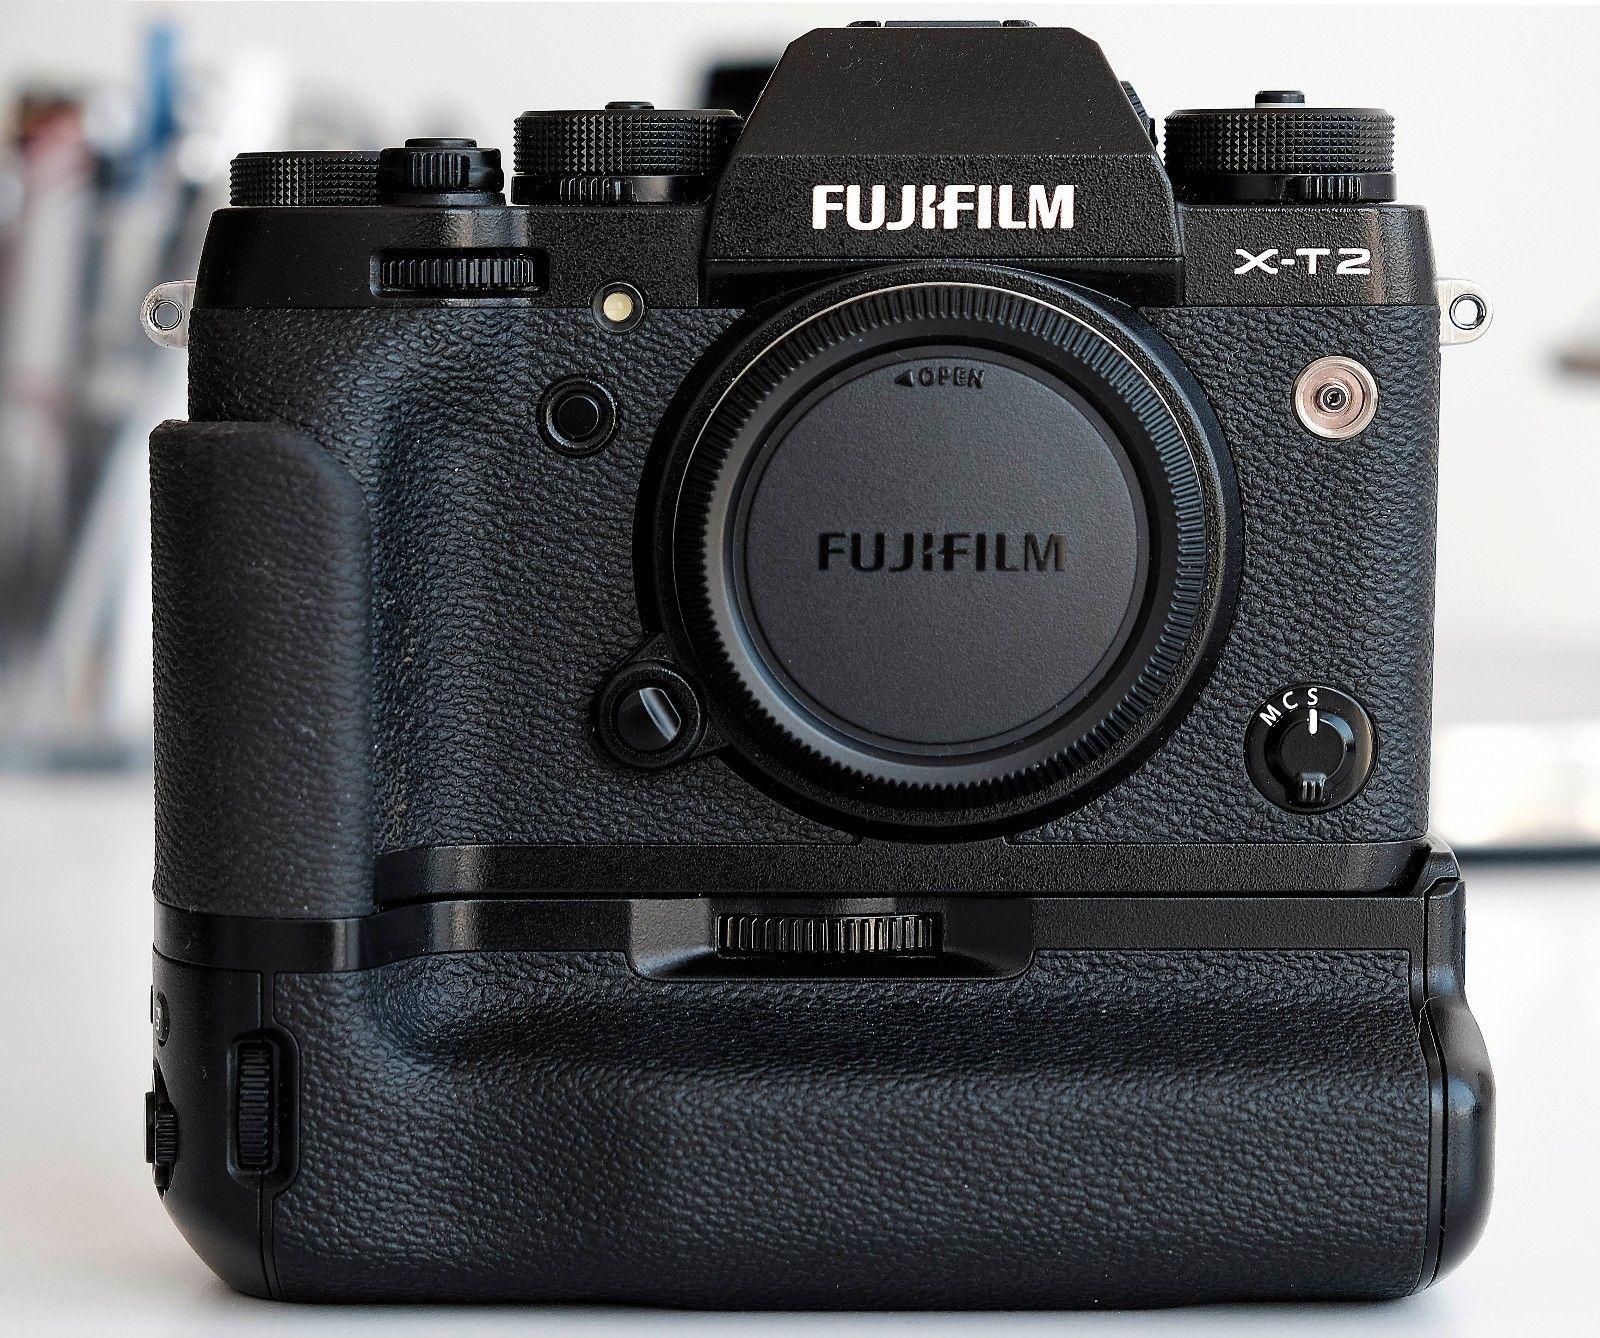 Fujifilm X-T2 inkl. Vertical Power Grip VPB-XT2